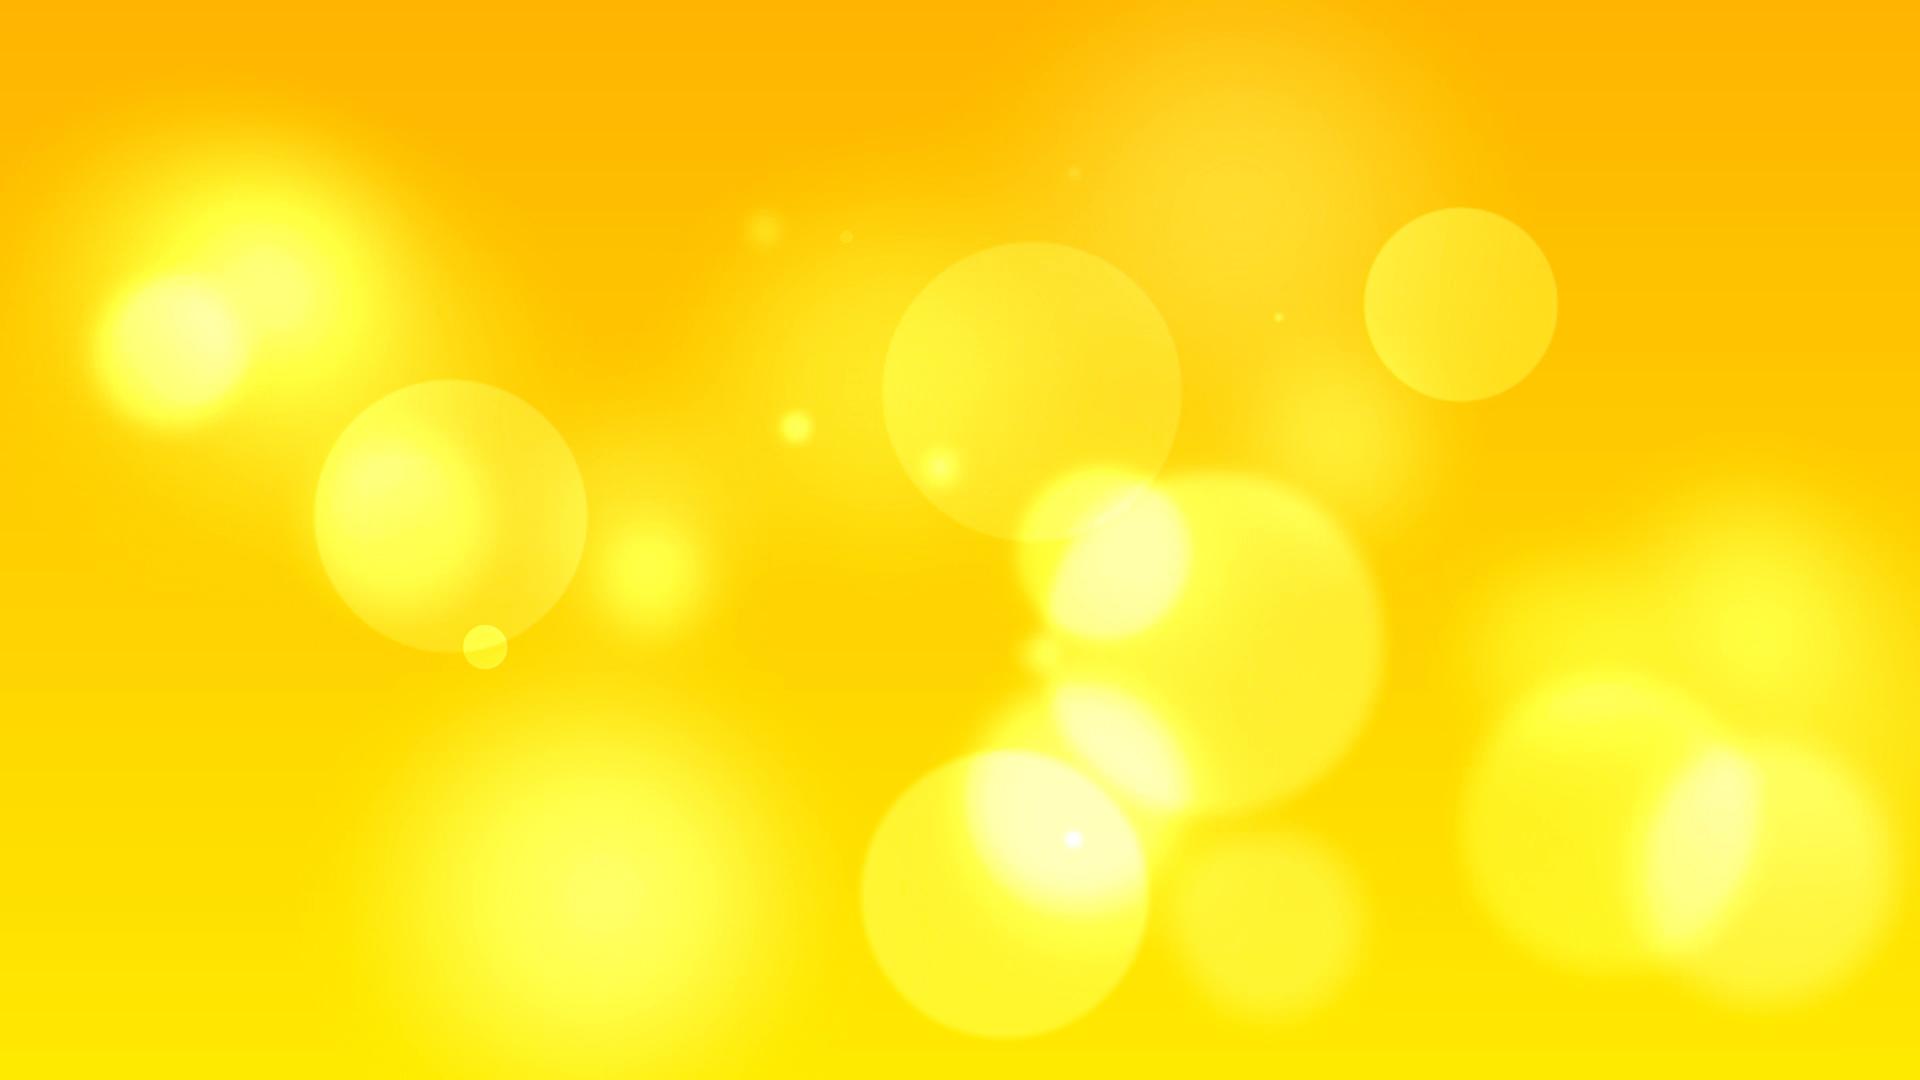 Aesthetic Yellow Wallpaper Full Hd For Desktop Wallpaper